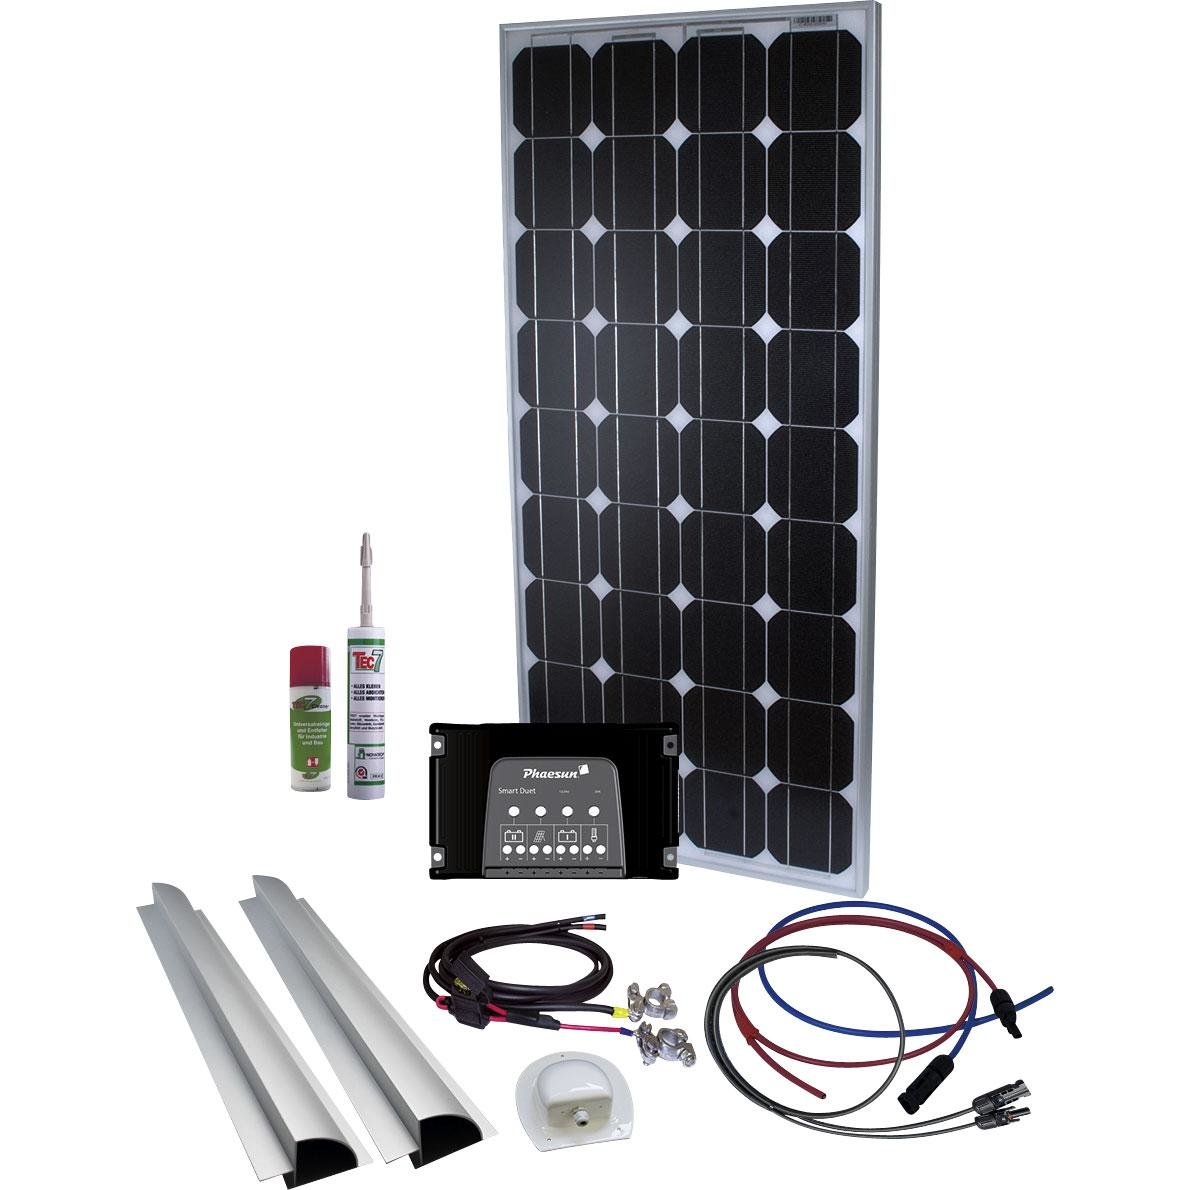 Phaesun Solarset Base Camp Two | 04250730290493